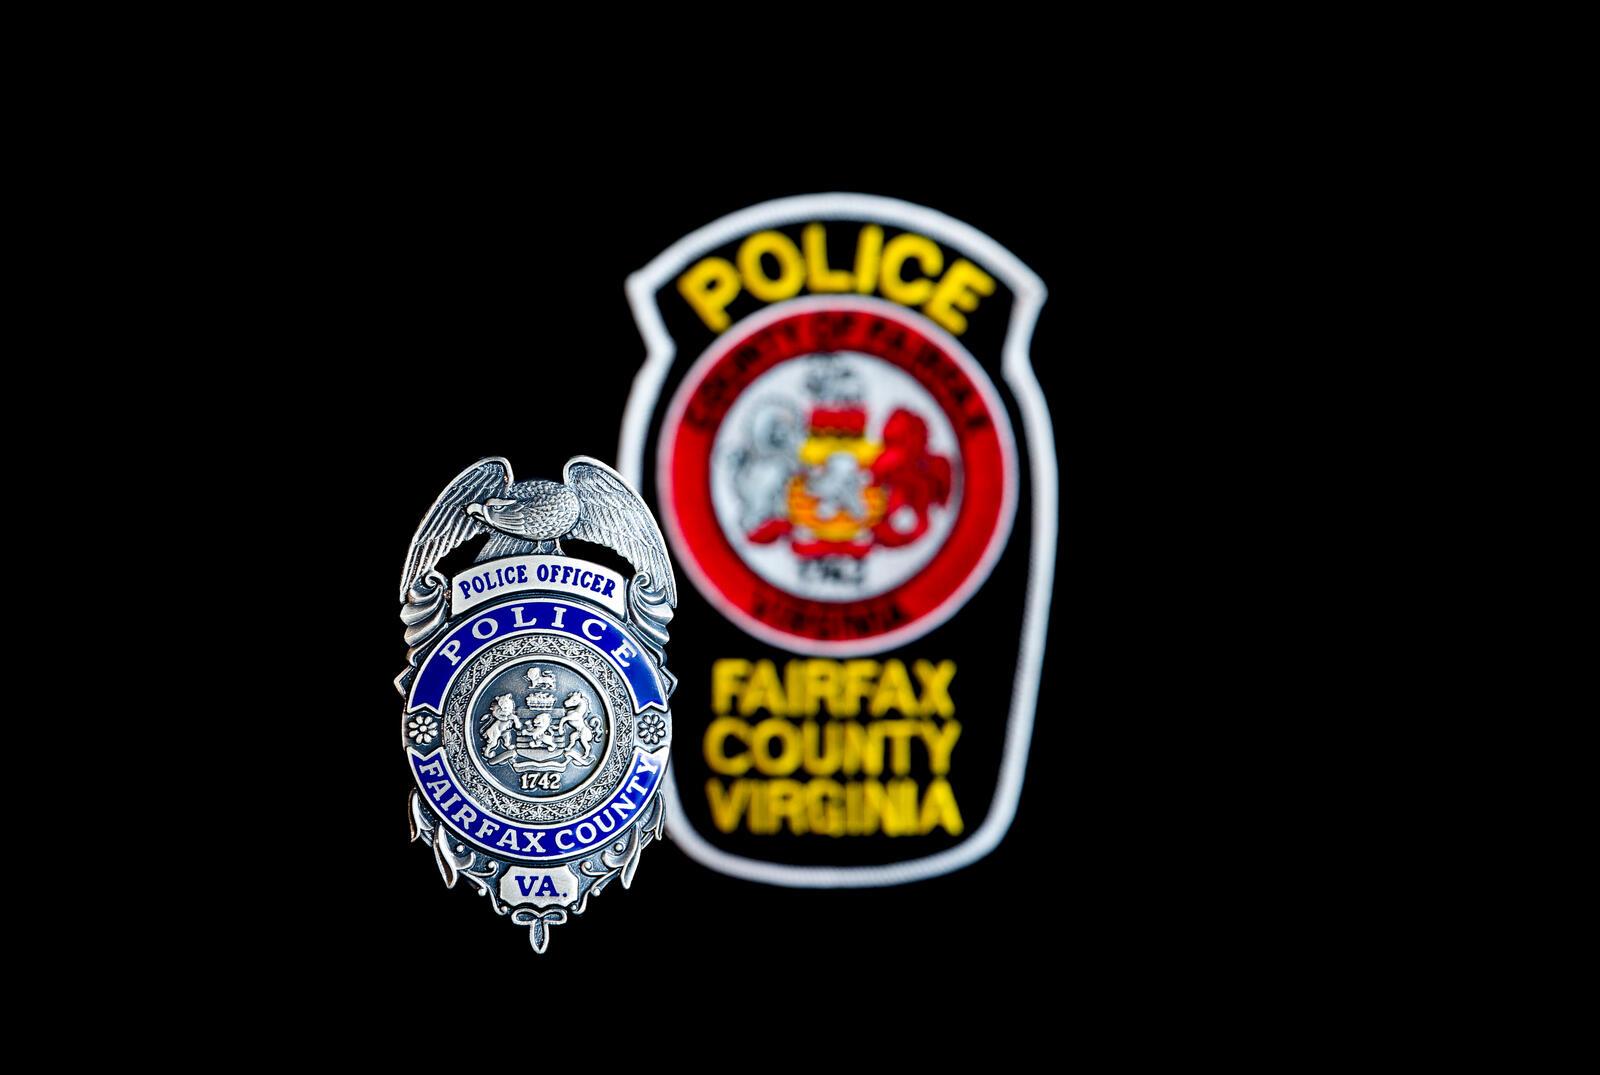 Fairfax County Police Department - 1598 Crime and Safety updates - Nextdoor – Nextdoor